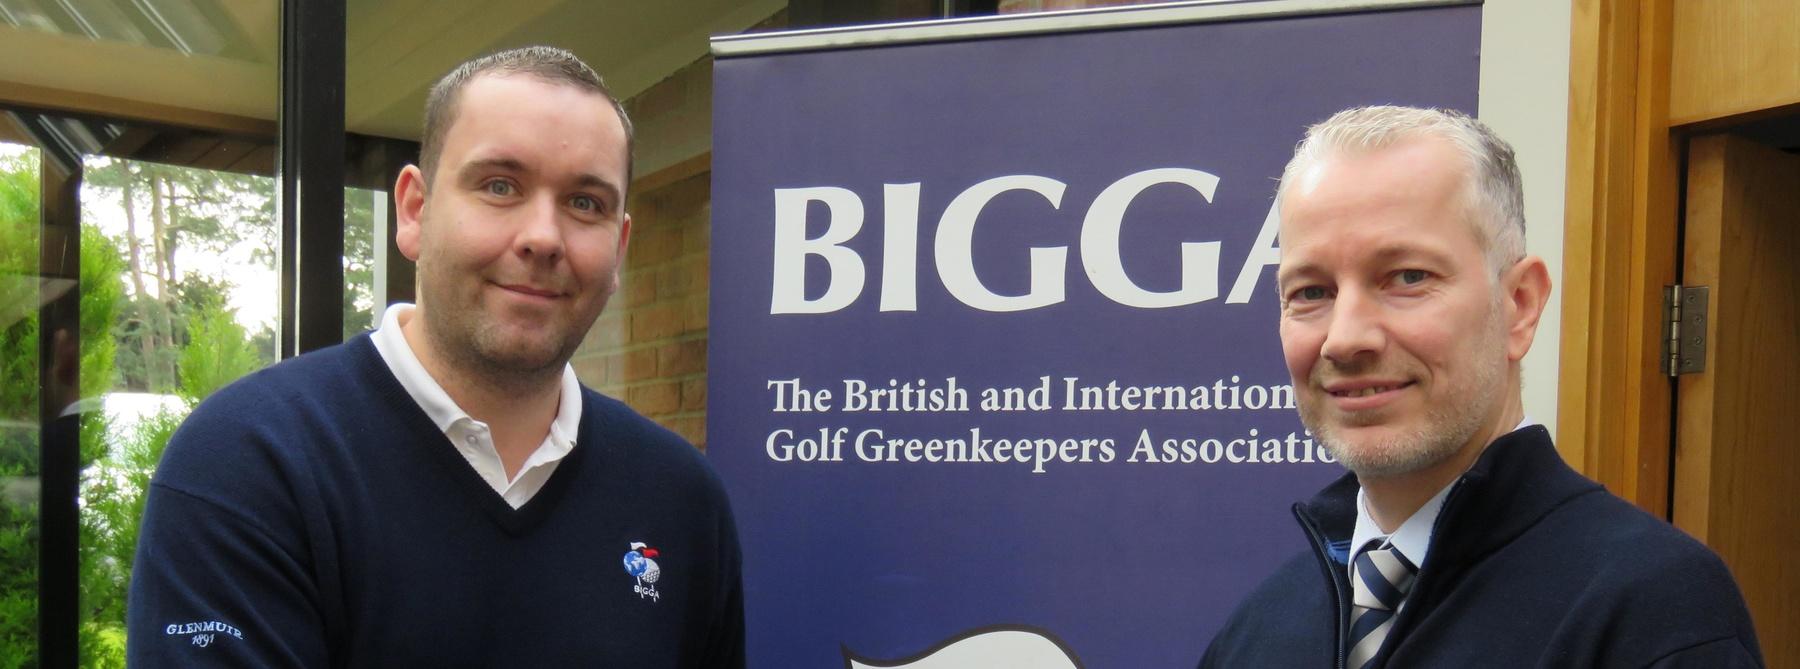 BIGGA's Gavin Rees headerand Richard Aitken Jnr 2